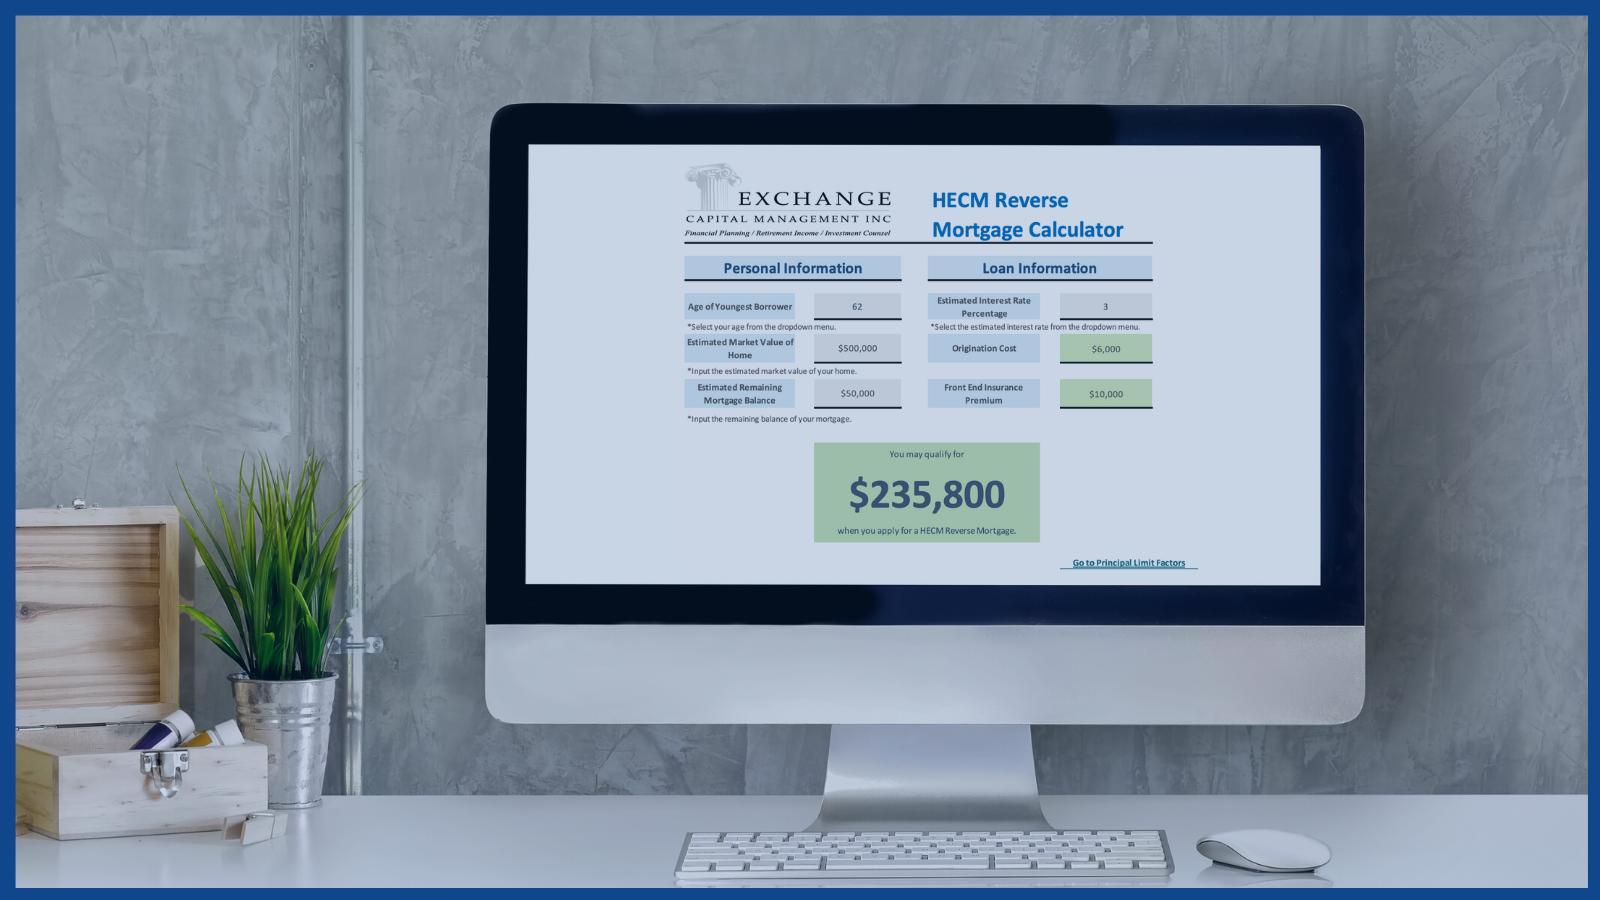 Exchange Capital HECM Reverse Mortgage Calculator